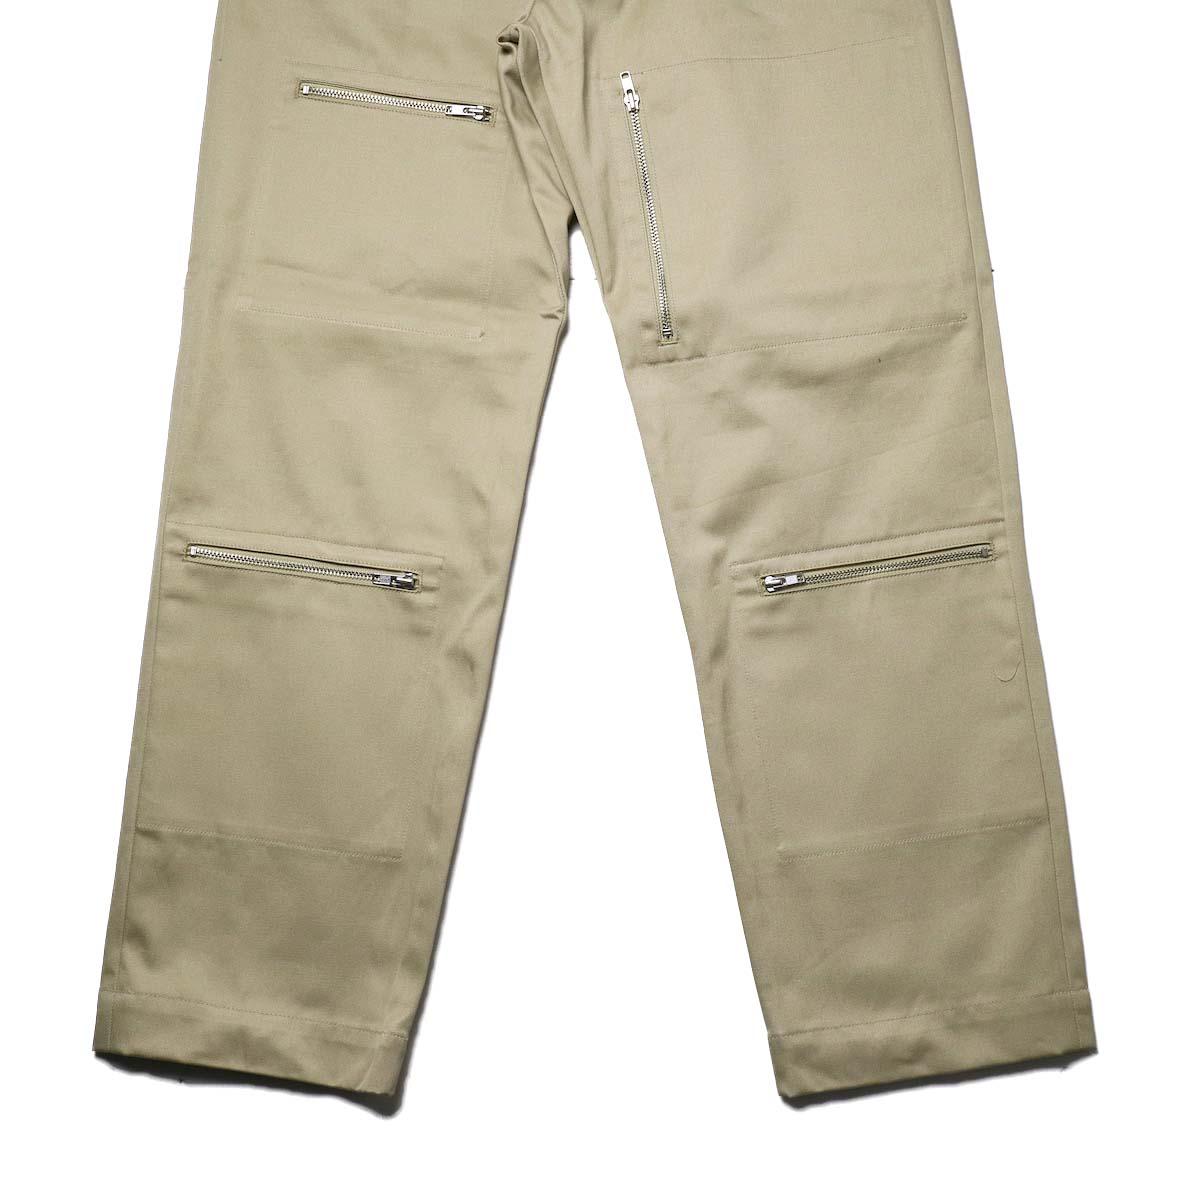 FUTURE PRIMITIVE / FP FZ FLIGHT CHINO PANTS (Beige)裾